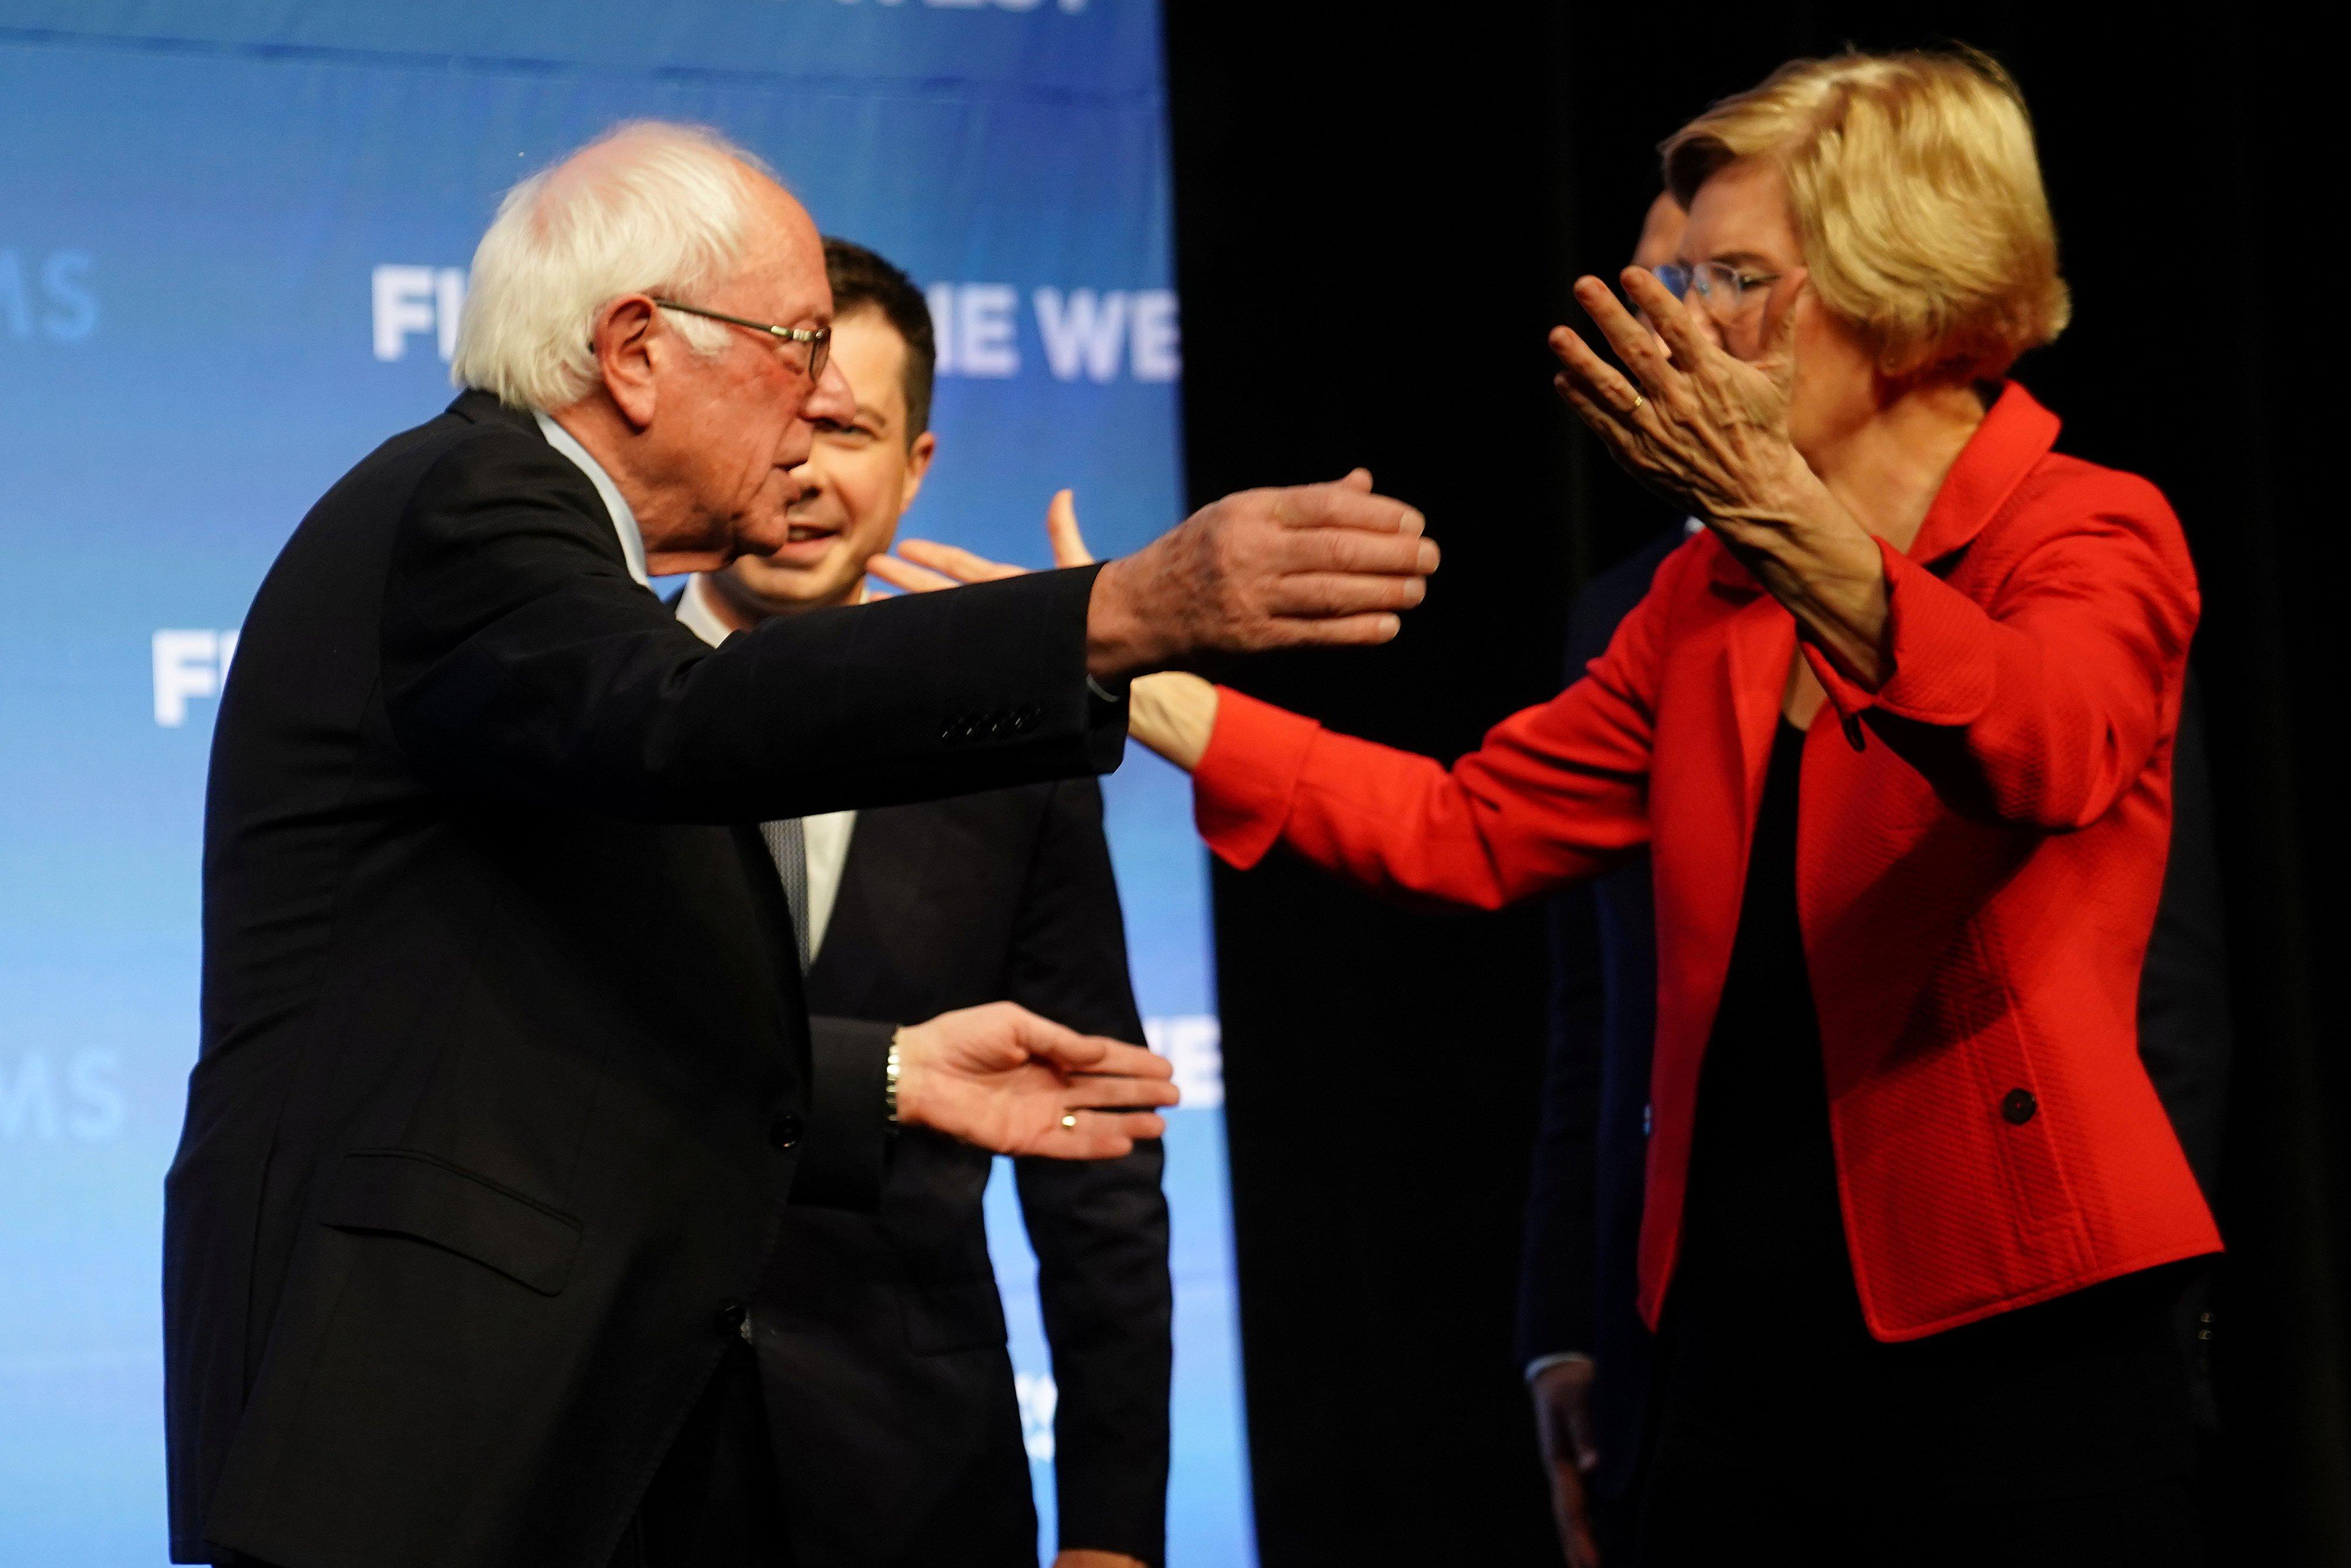 Democratic U.S. presidential candidates Bernie Sanders and Elizabeth Warren hug on stage at a First in the West Event at the Bellagio Hotel in Las Vegas, Nevada, U.S., Nov. 17, 2019. REUTERS/Carlo Allegri